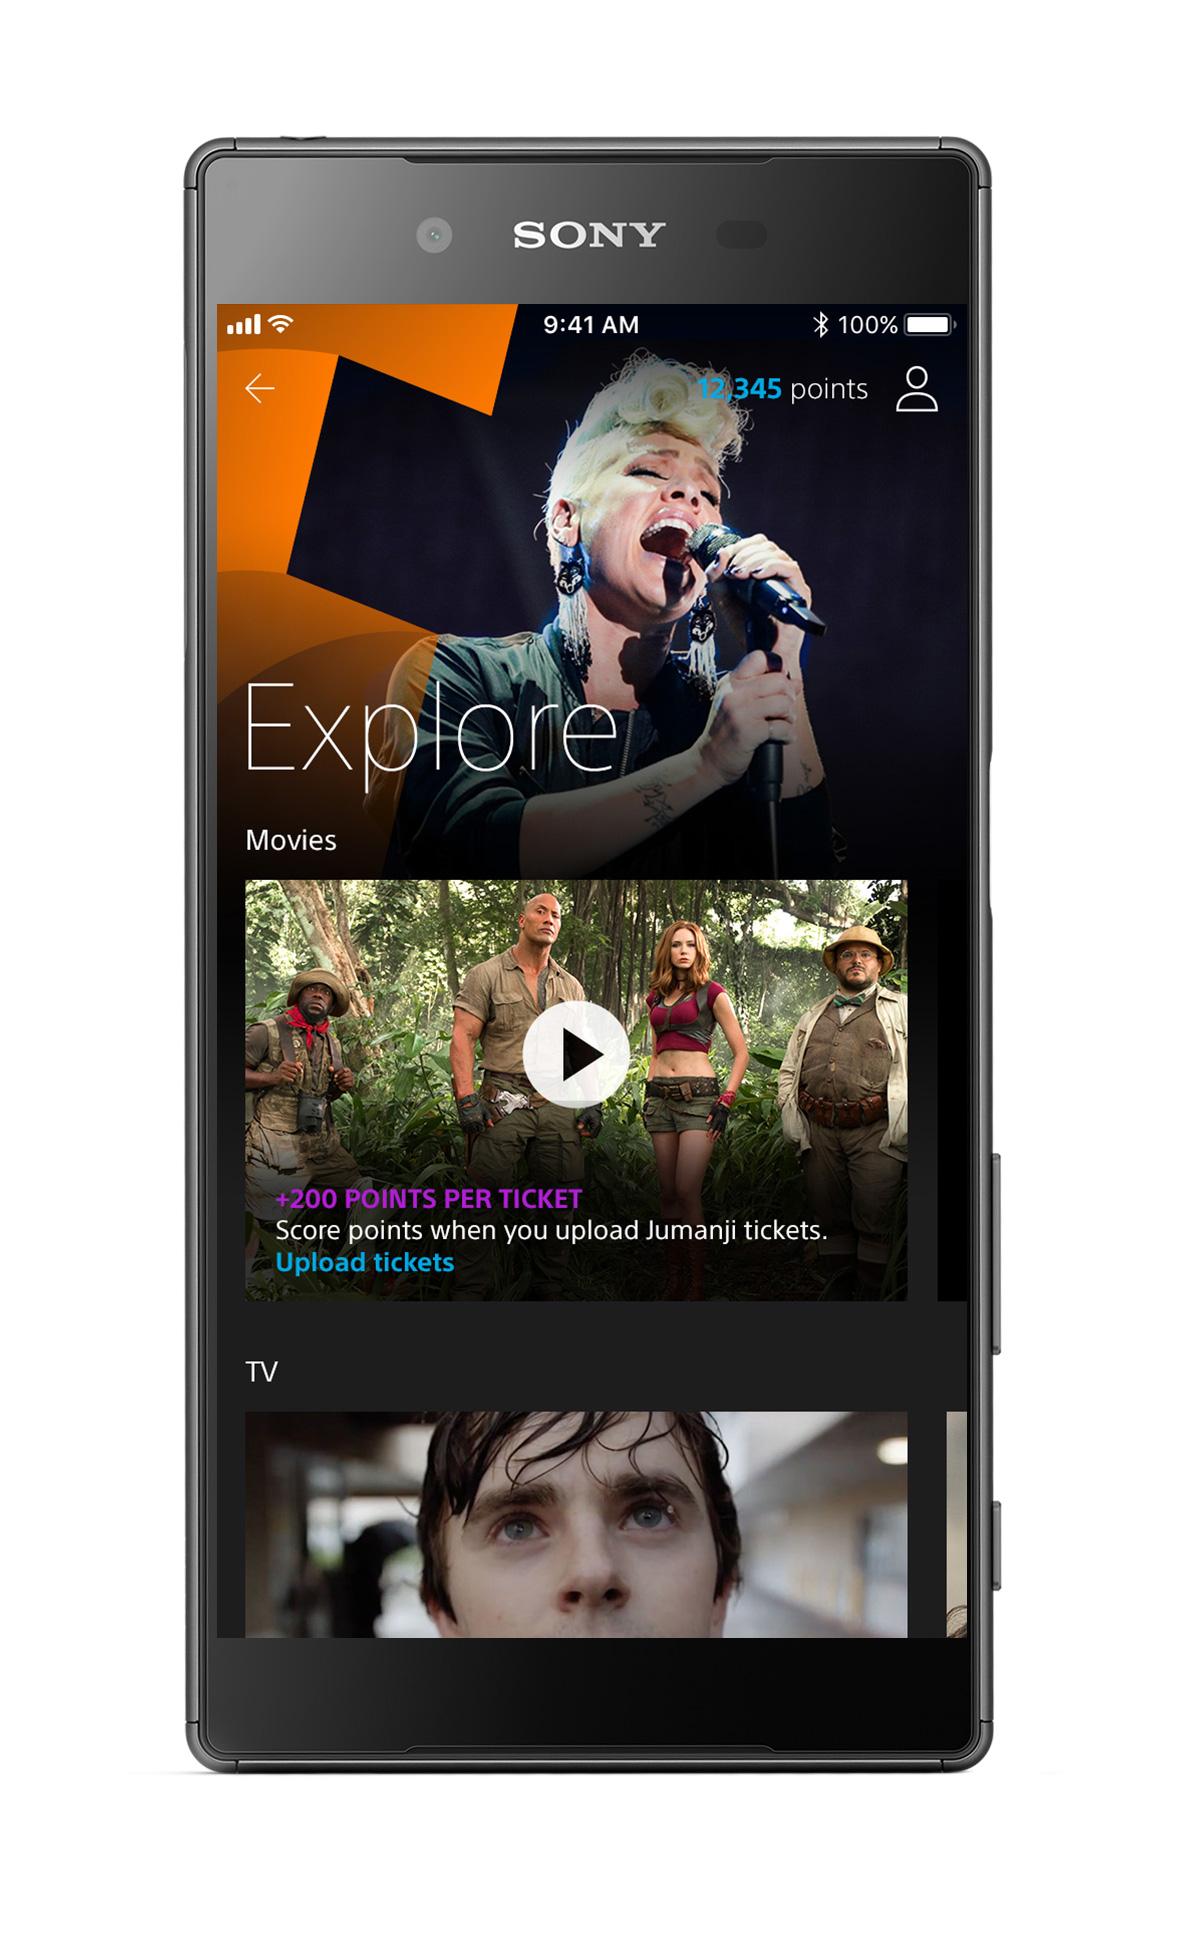 Phone-App-Mockup-2explore.jpg